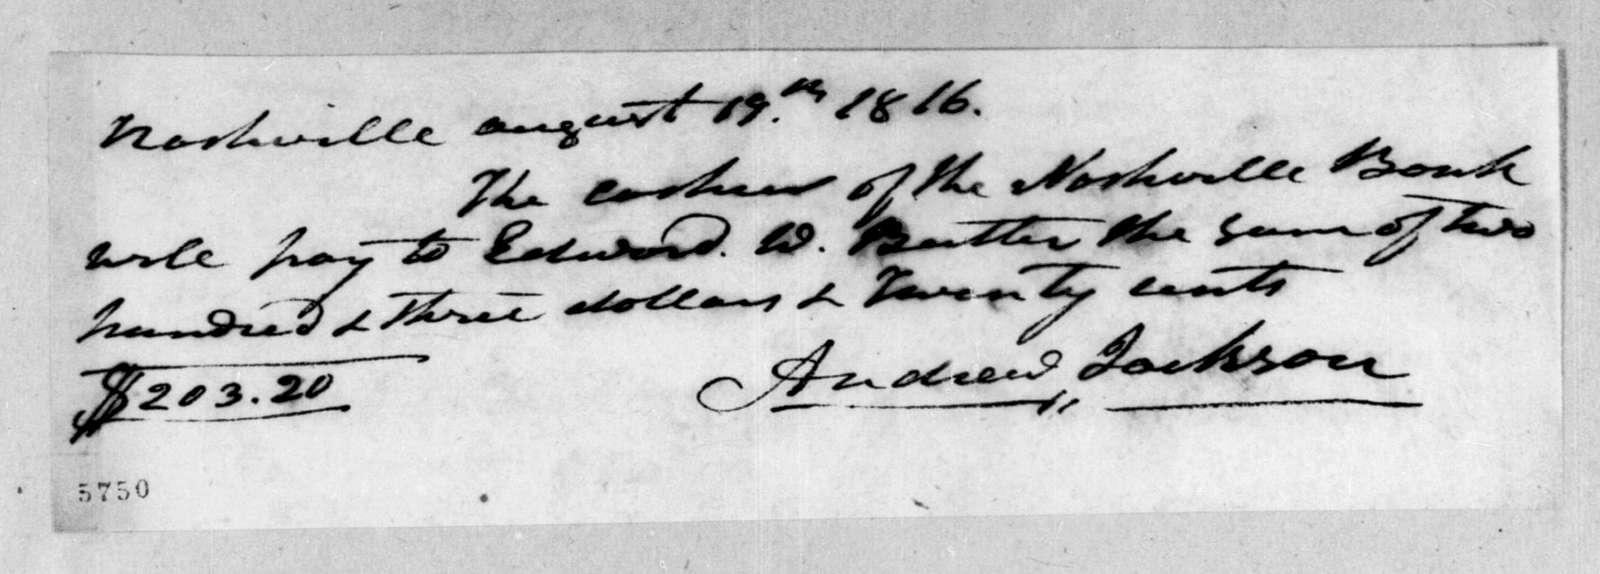 Andrew Jackson to Edward George Washington Butler, August 19, 1816